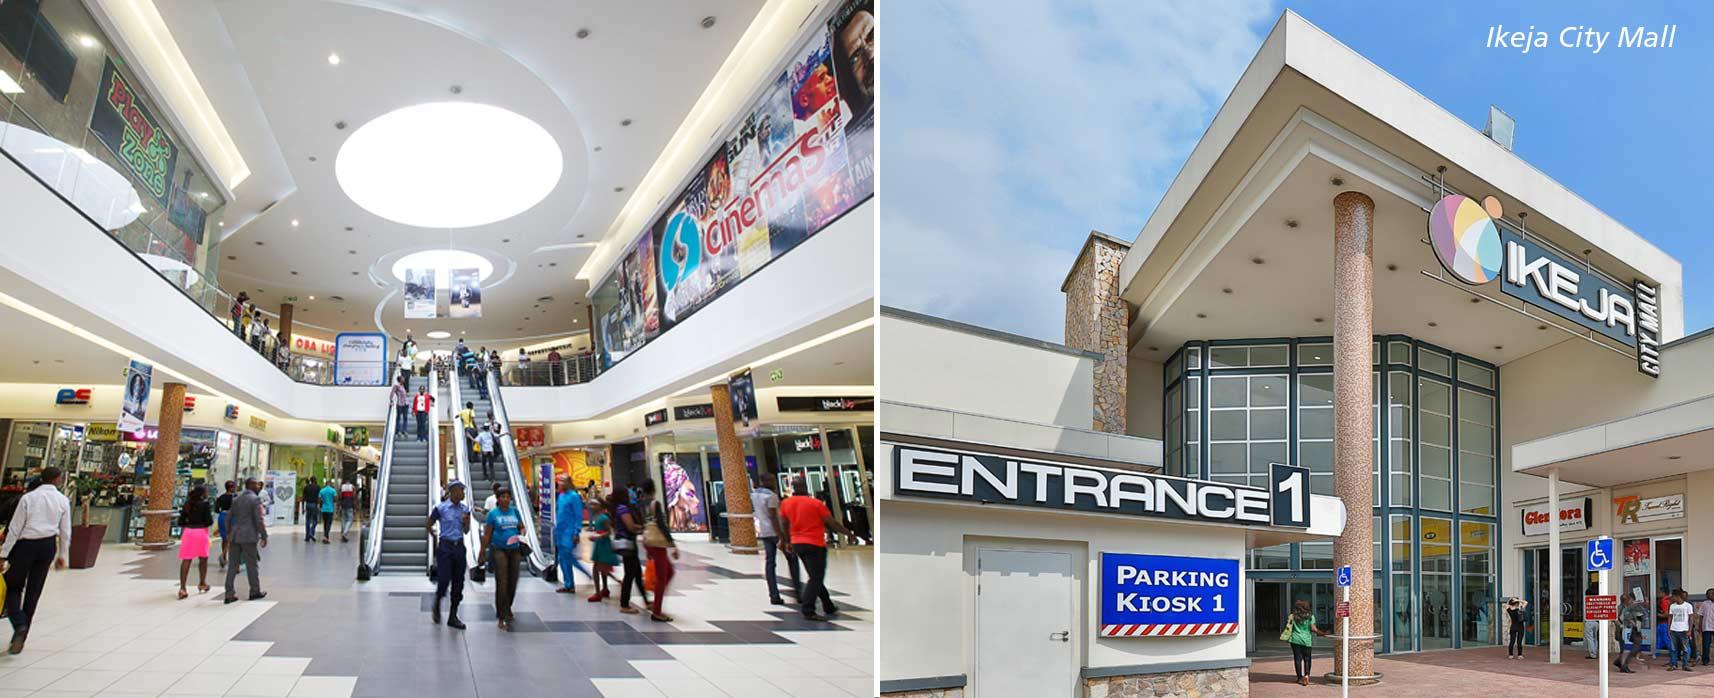 Ikeja City Mall. Image Source: RMB Westport